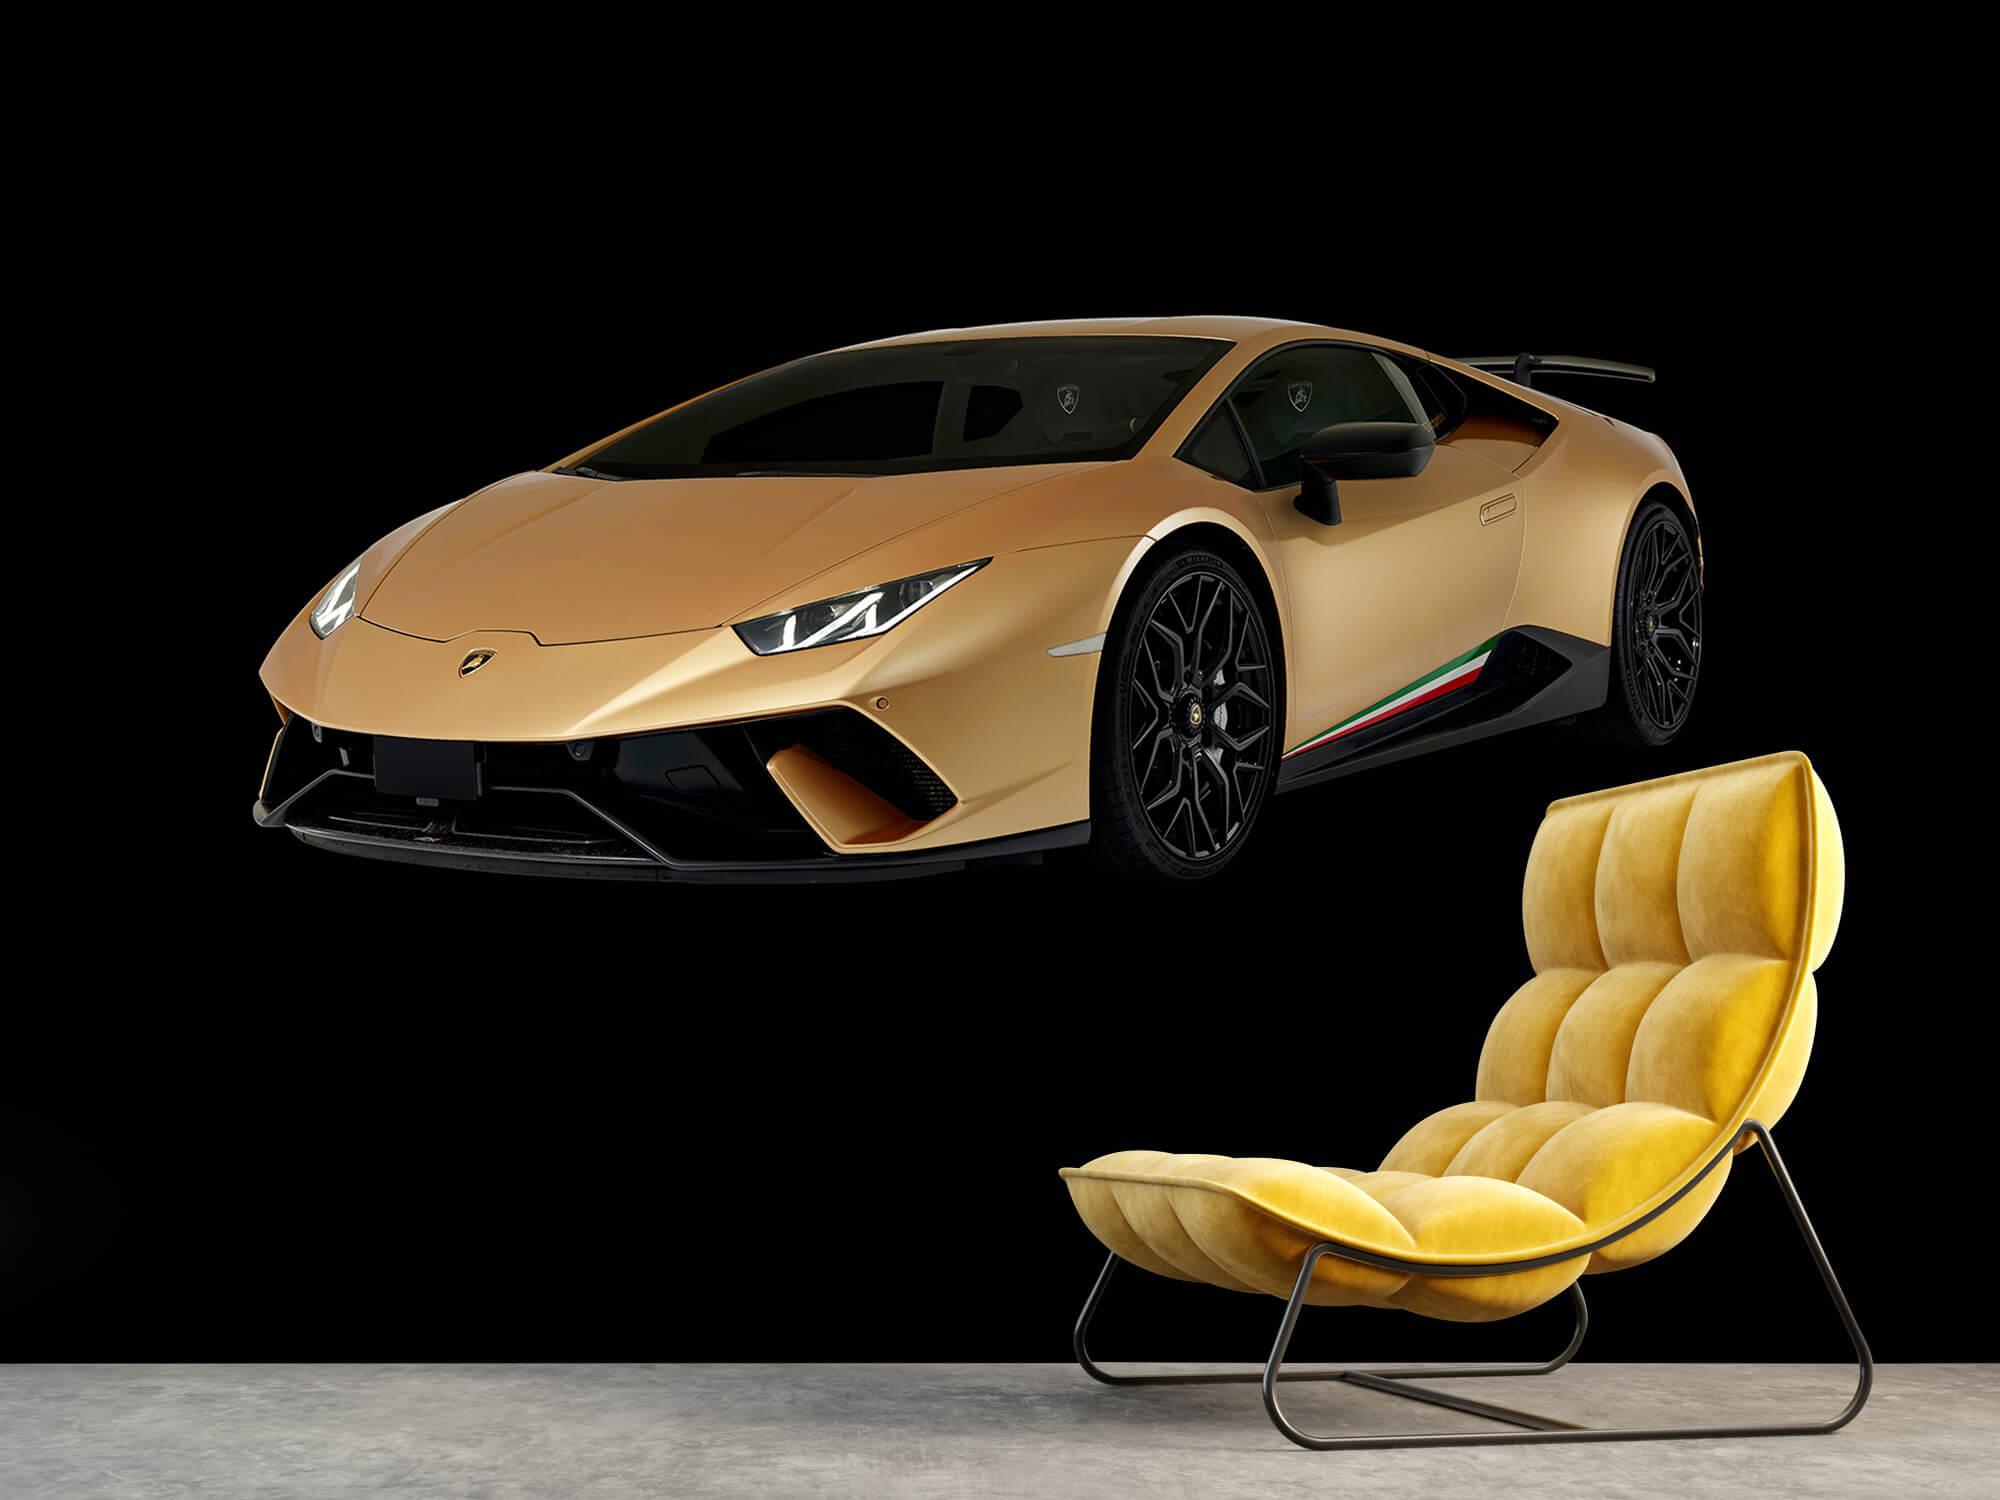 Wallpaper Lamborghini Huracán - Höger fram, svart 3